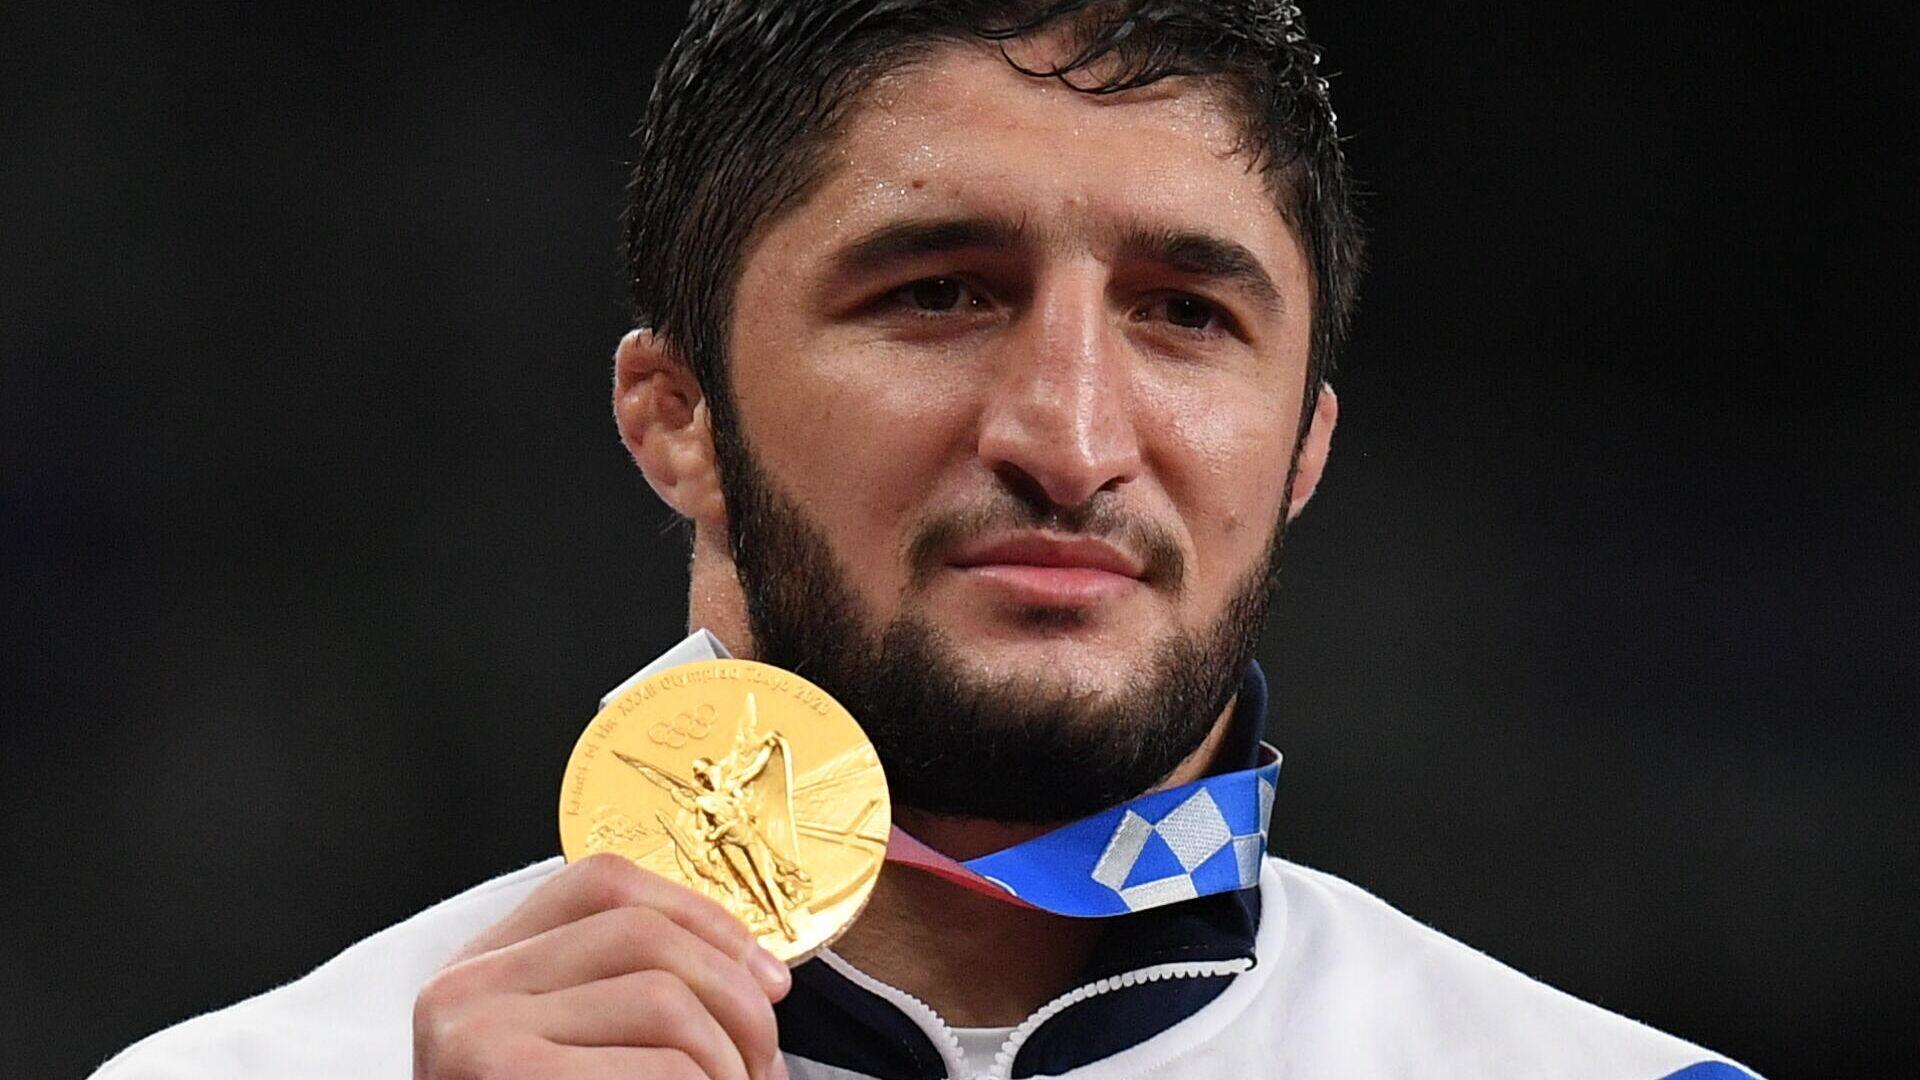 Abdulrashid Sadulaev, luchador ruso - Sputnik Mundo, 1920, 07.08.2021